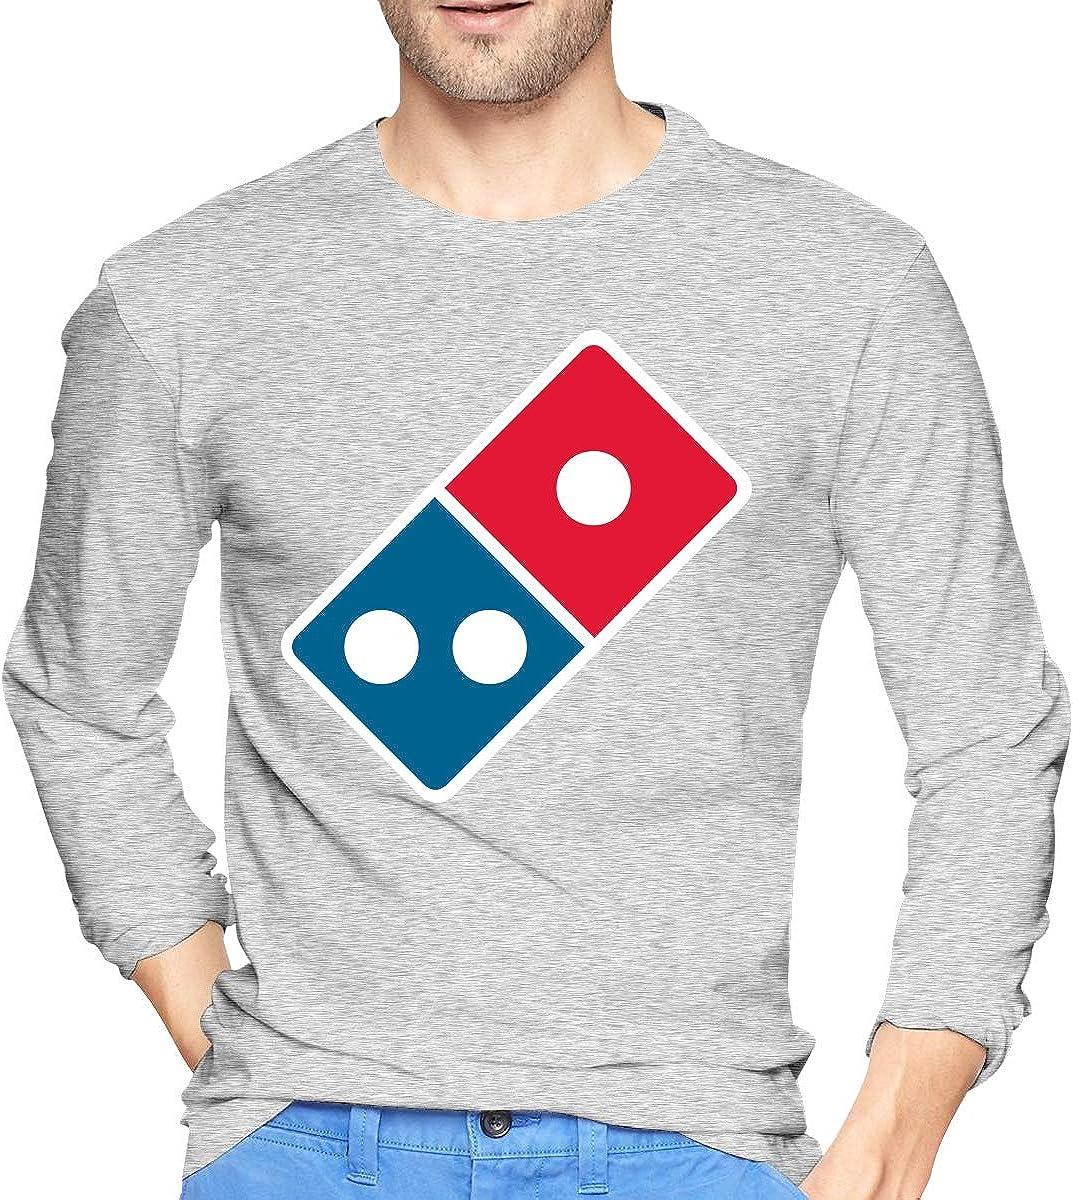 Xuankeke Domino's_Pizza_Logo Round Collar Tunic Top Sweatshirt for Men